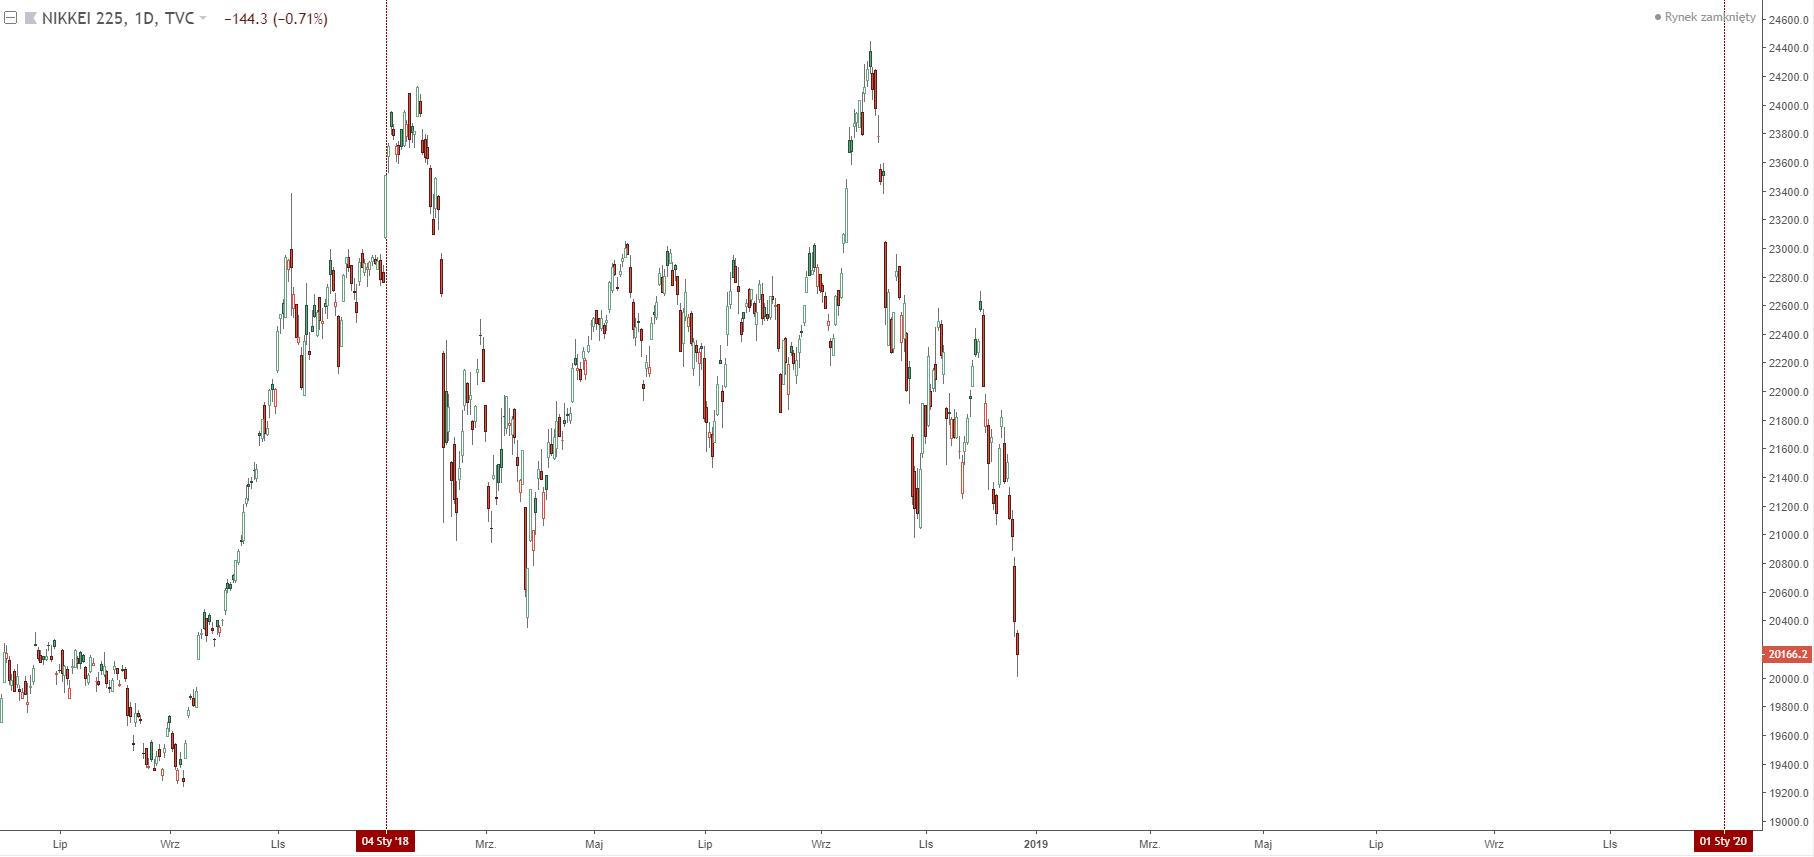 wykres Nikkei 225 D1 22.12.2018